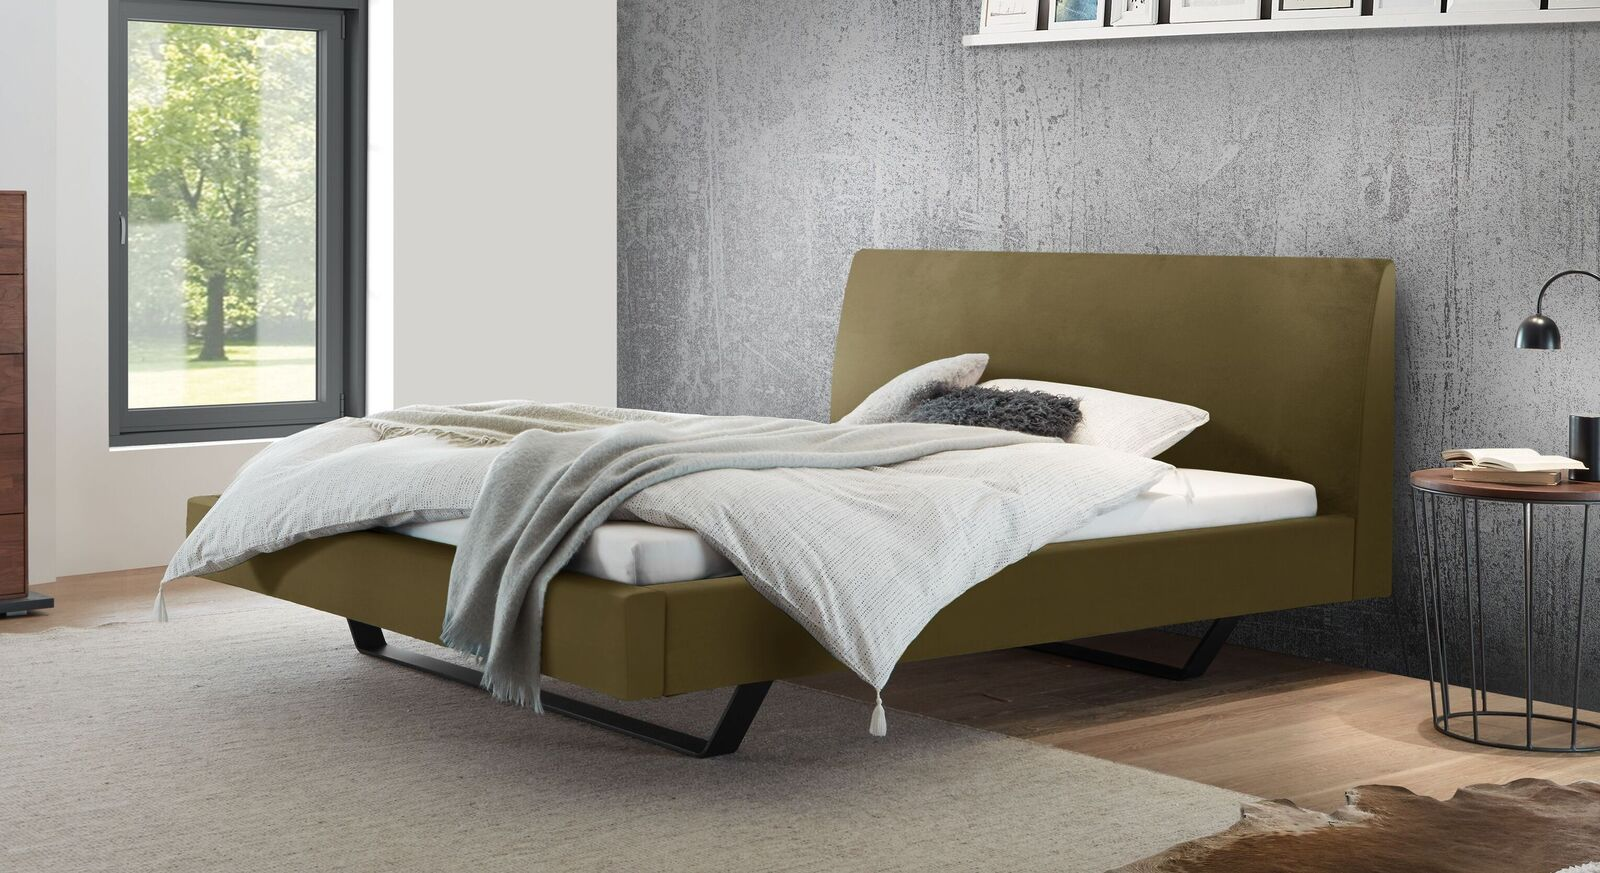 Bett Lieven mit khakifarbenem Samtbezug